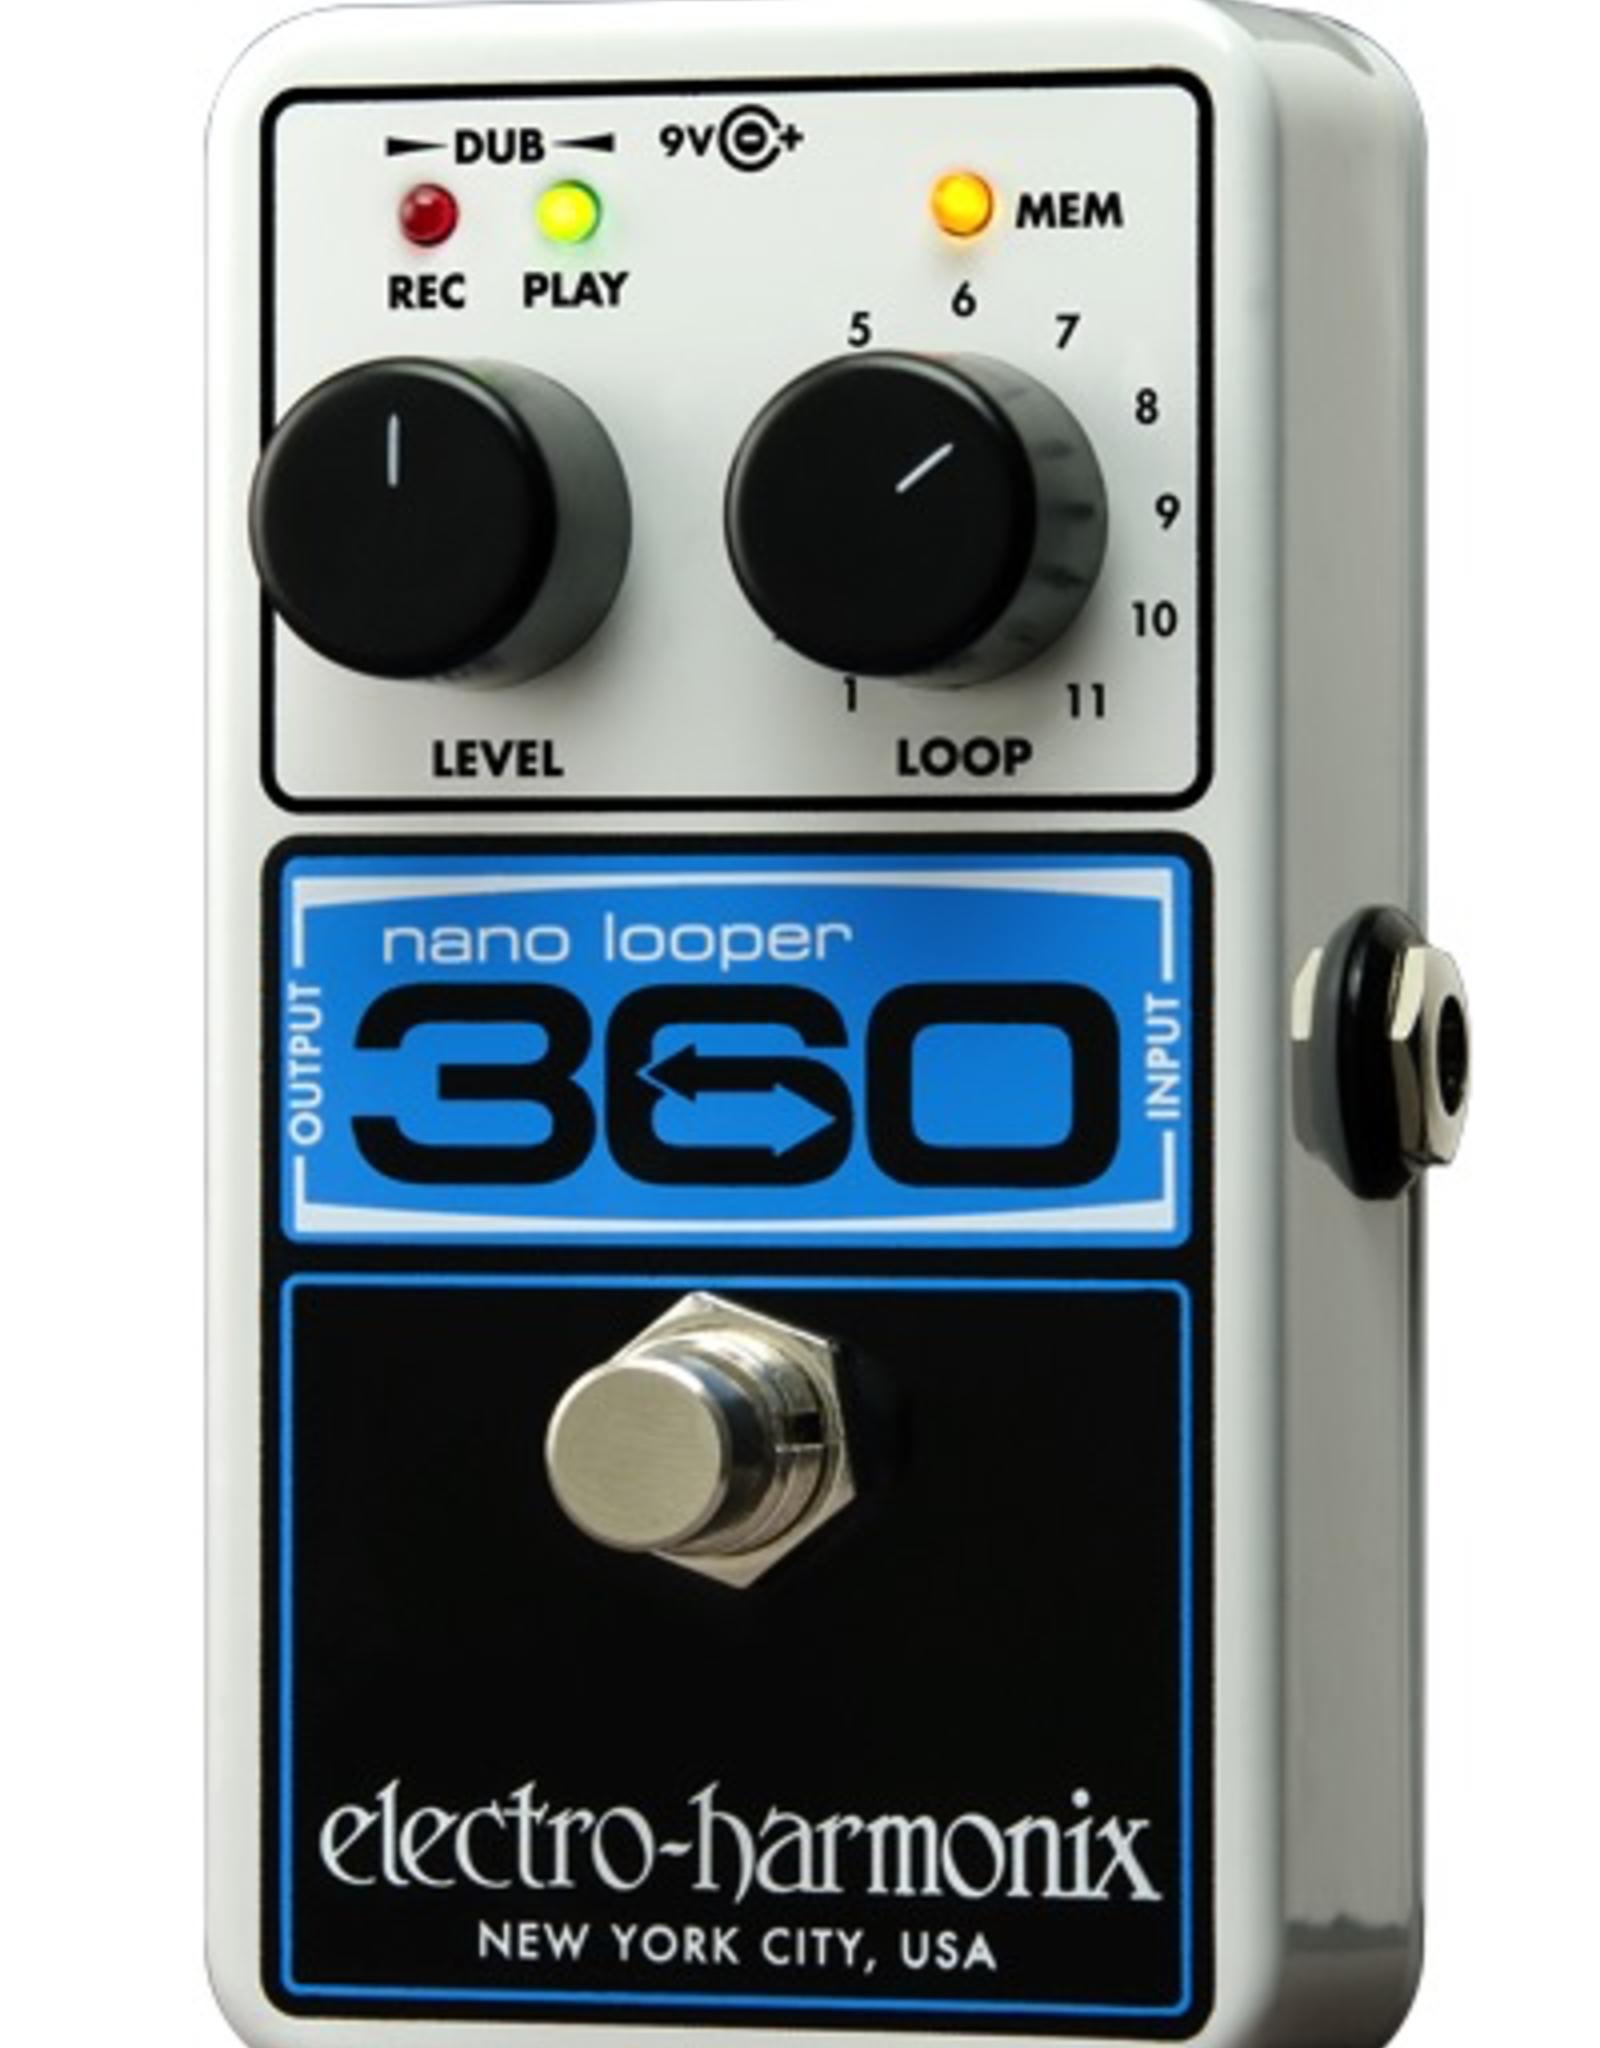 Electro-Harmonix Electro-Harmonix 360 Nano Looper - Compact Looper, 9.6DC-200 PSU Included